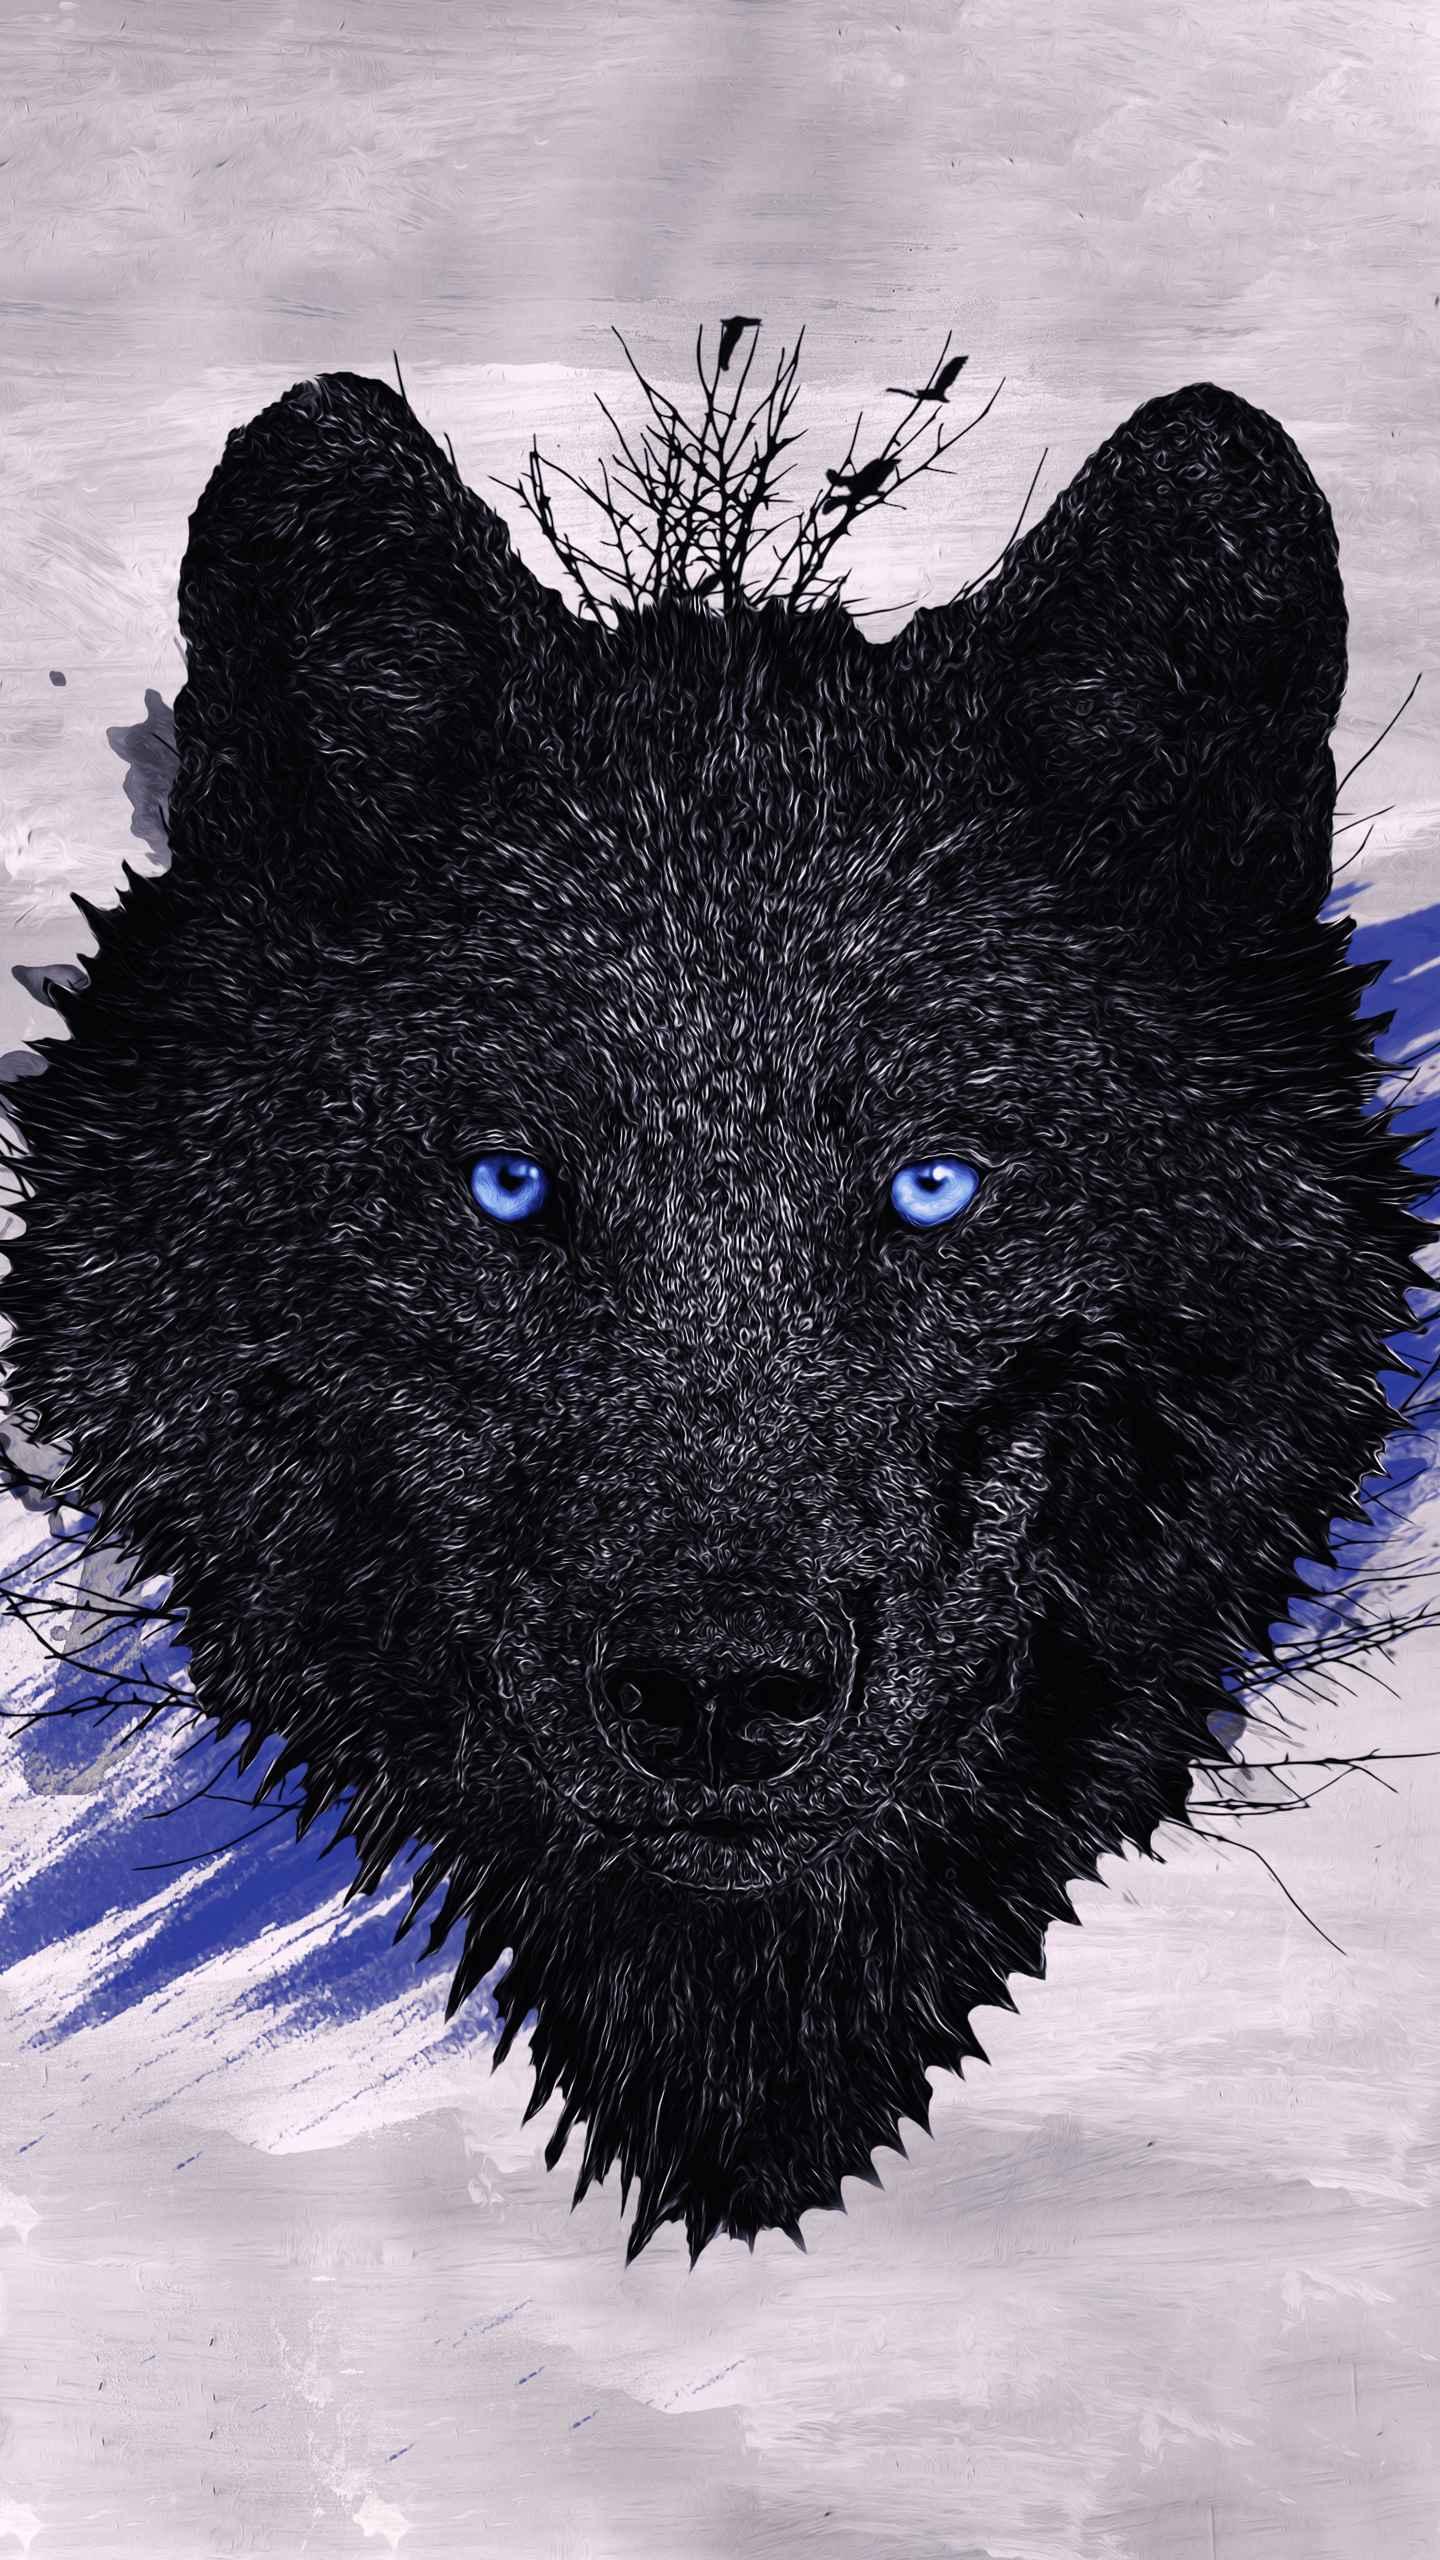 Iphone 6 Black Wolf Wallpaper Black Wolf Paint Iphone Wallpaper 1440x2560 Wallpaper Teahub Io